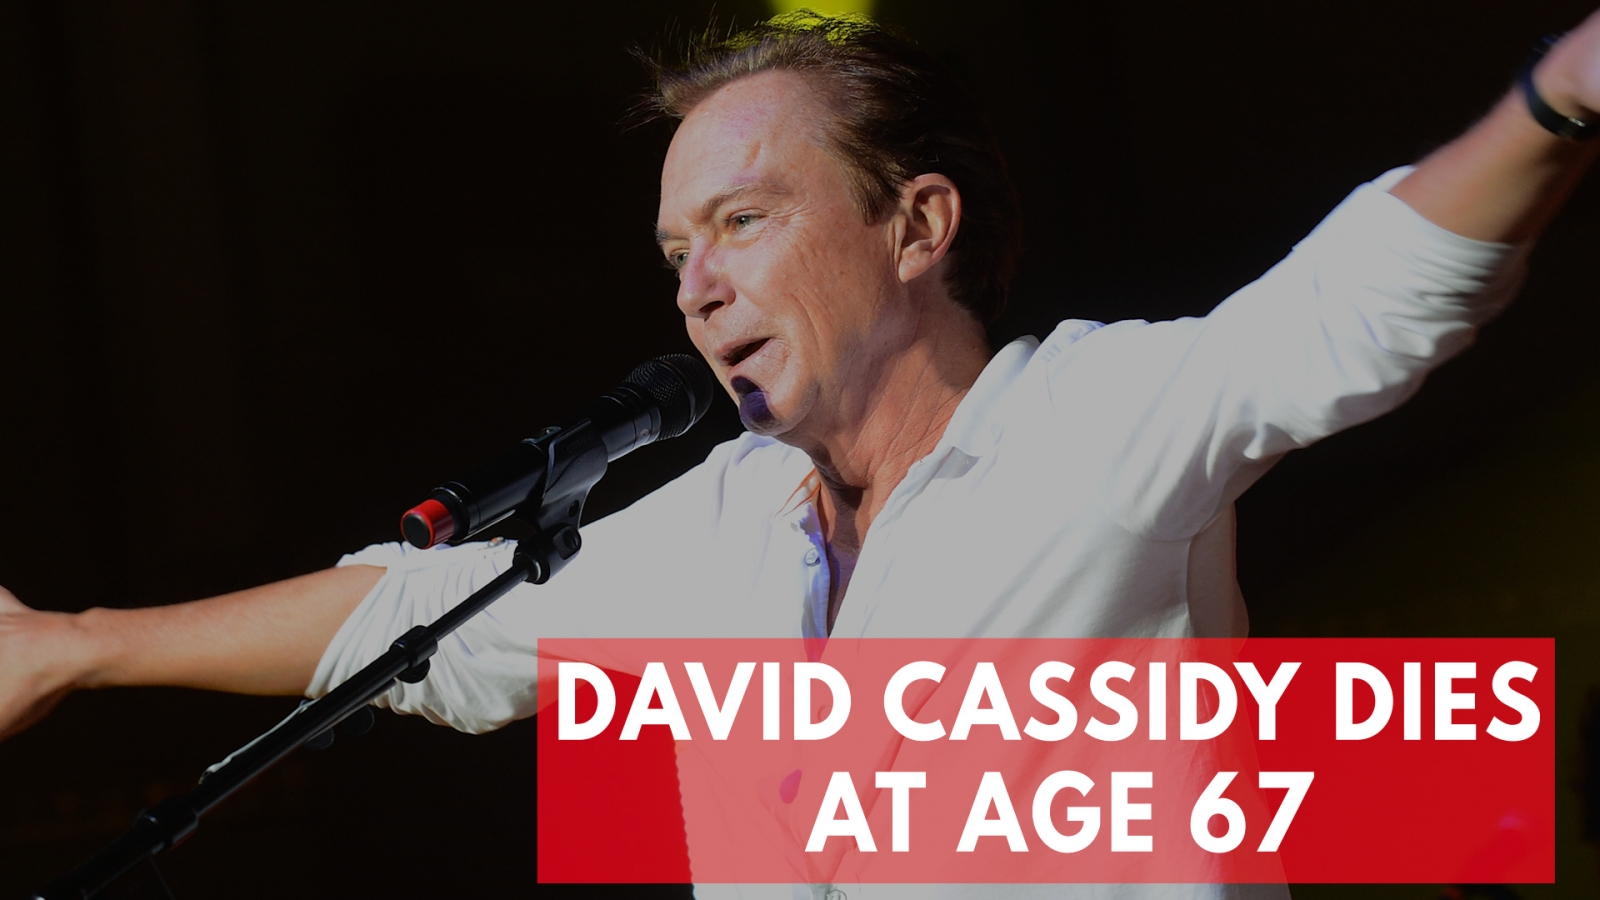 david-cassidy-1970s-teen-heartthrob-dies-at-age-67